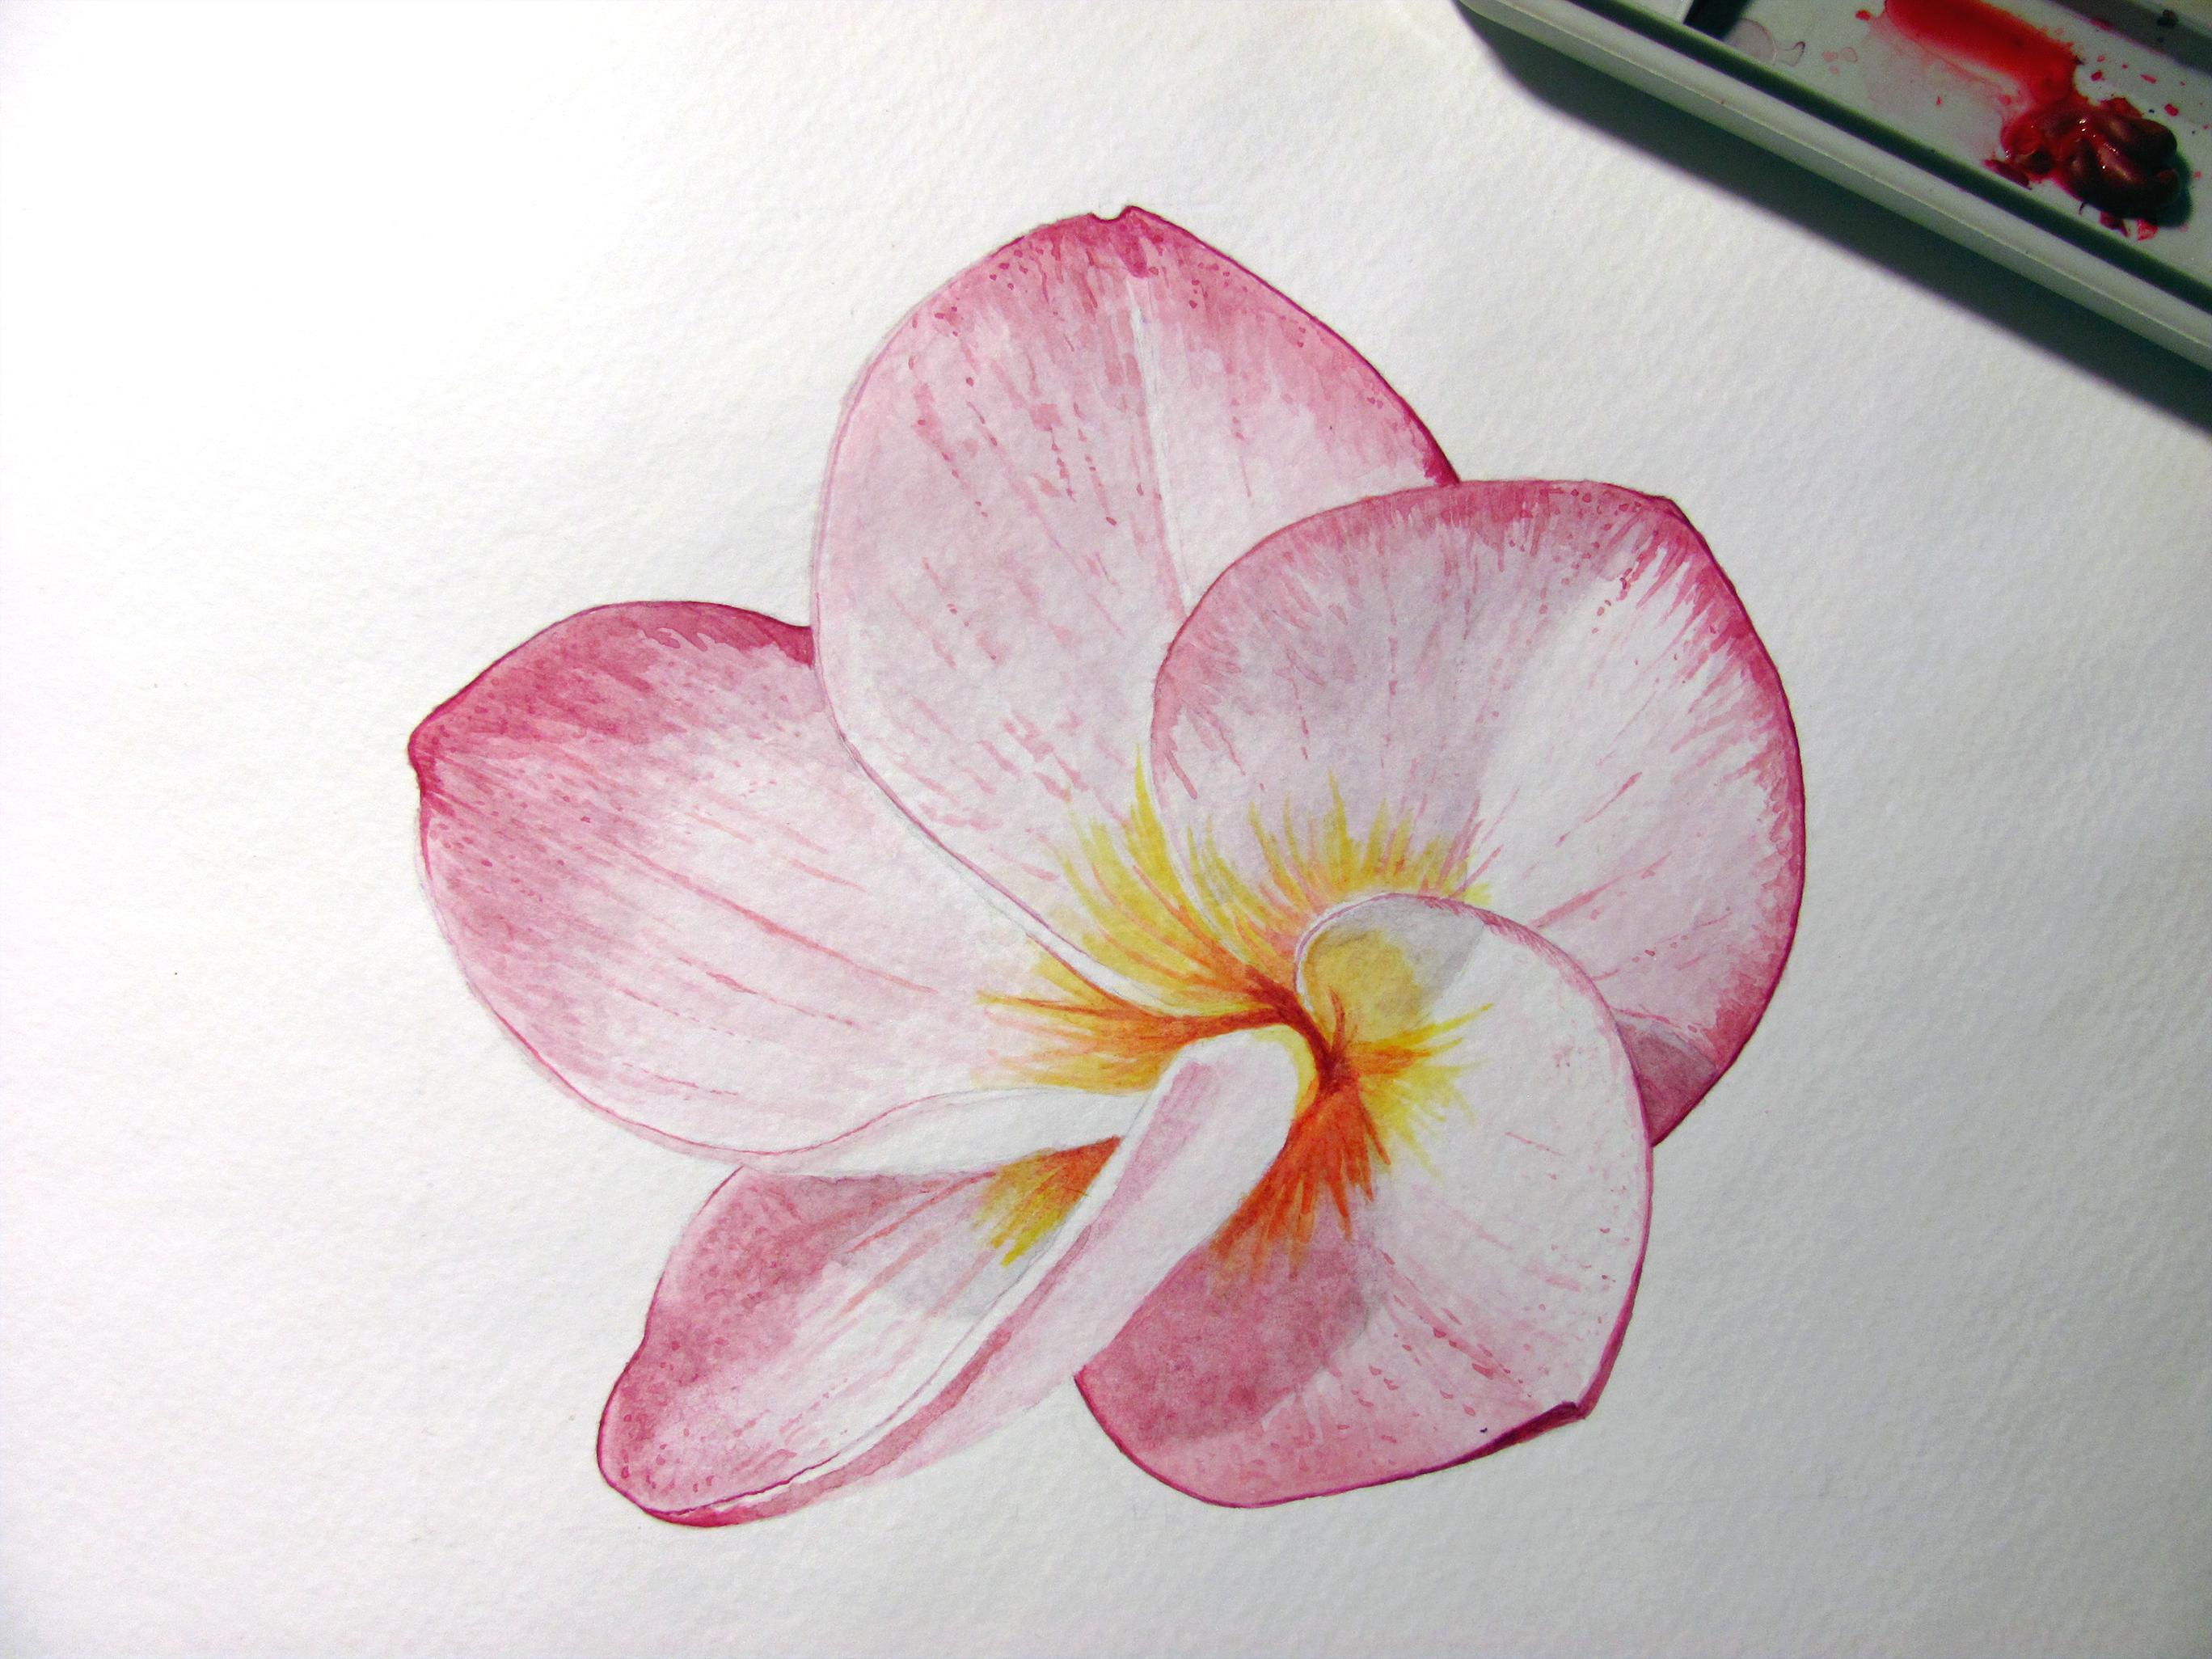 Watercolor plumeria, painted by me in 2015 #watercolors #plumeria #watercolor paintings